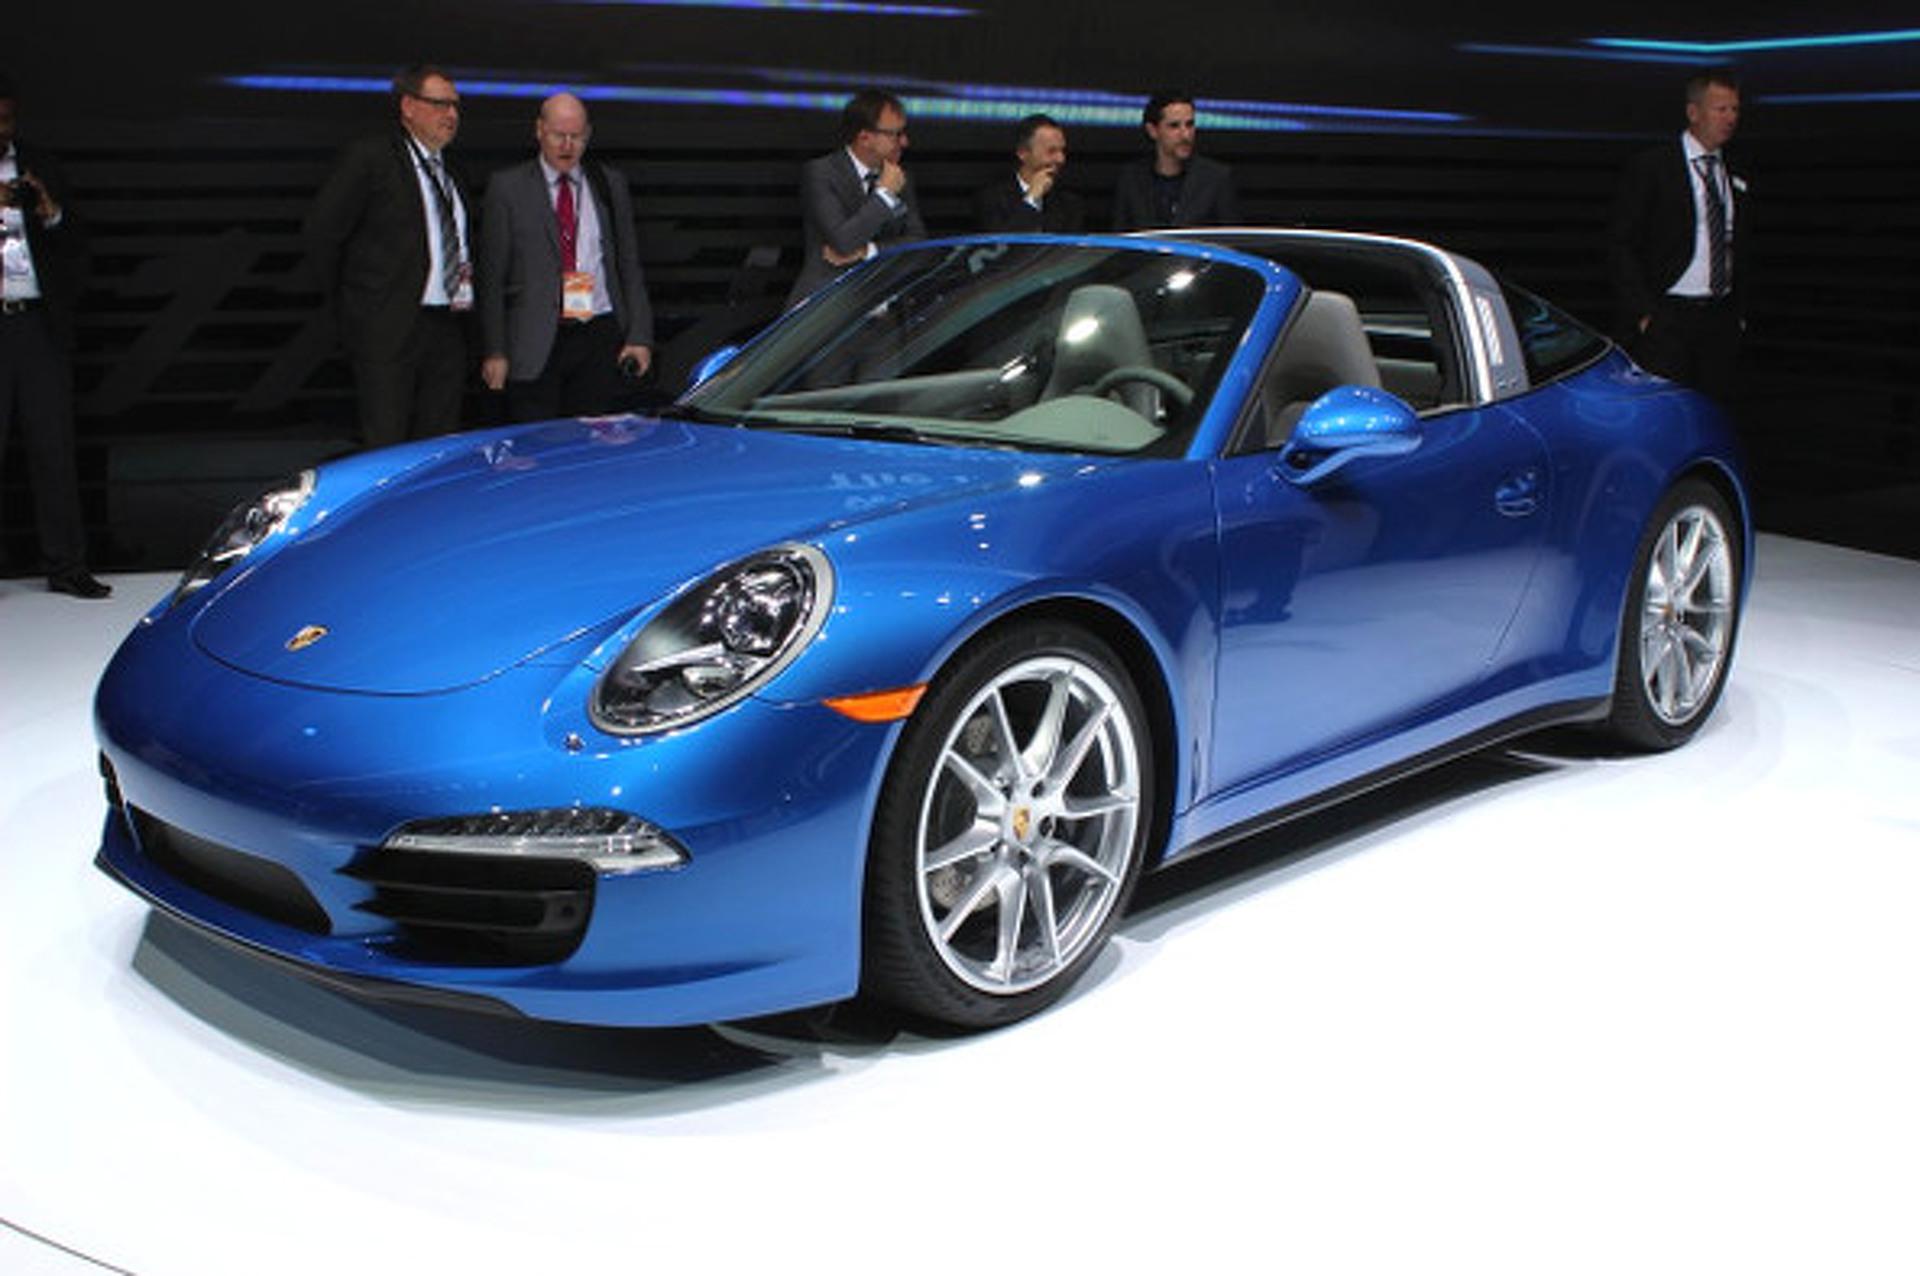 Porsche 911 Targa Is an Overly Complicated Homage [w/video]